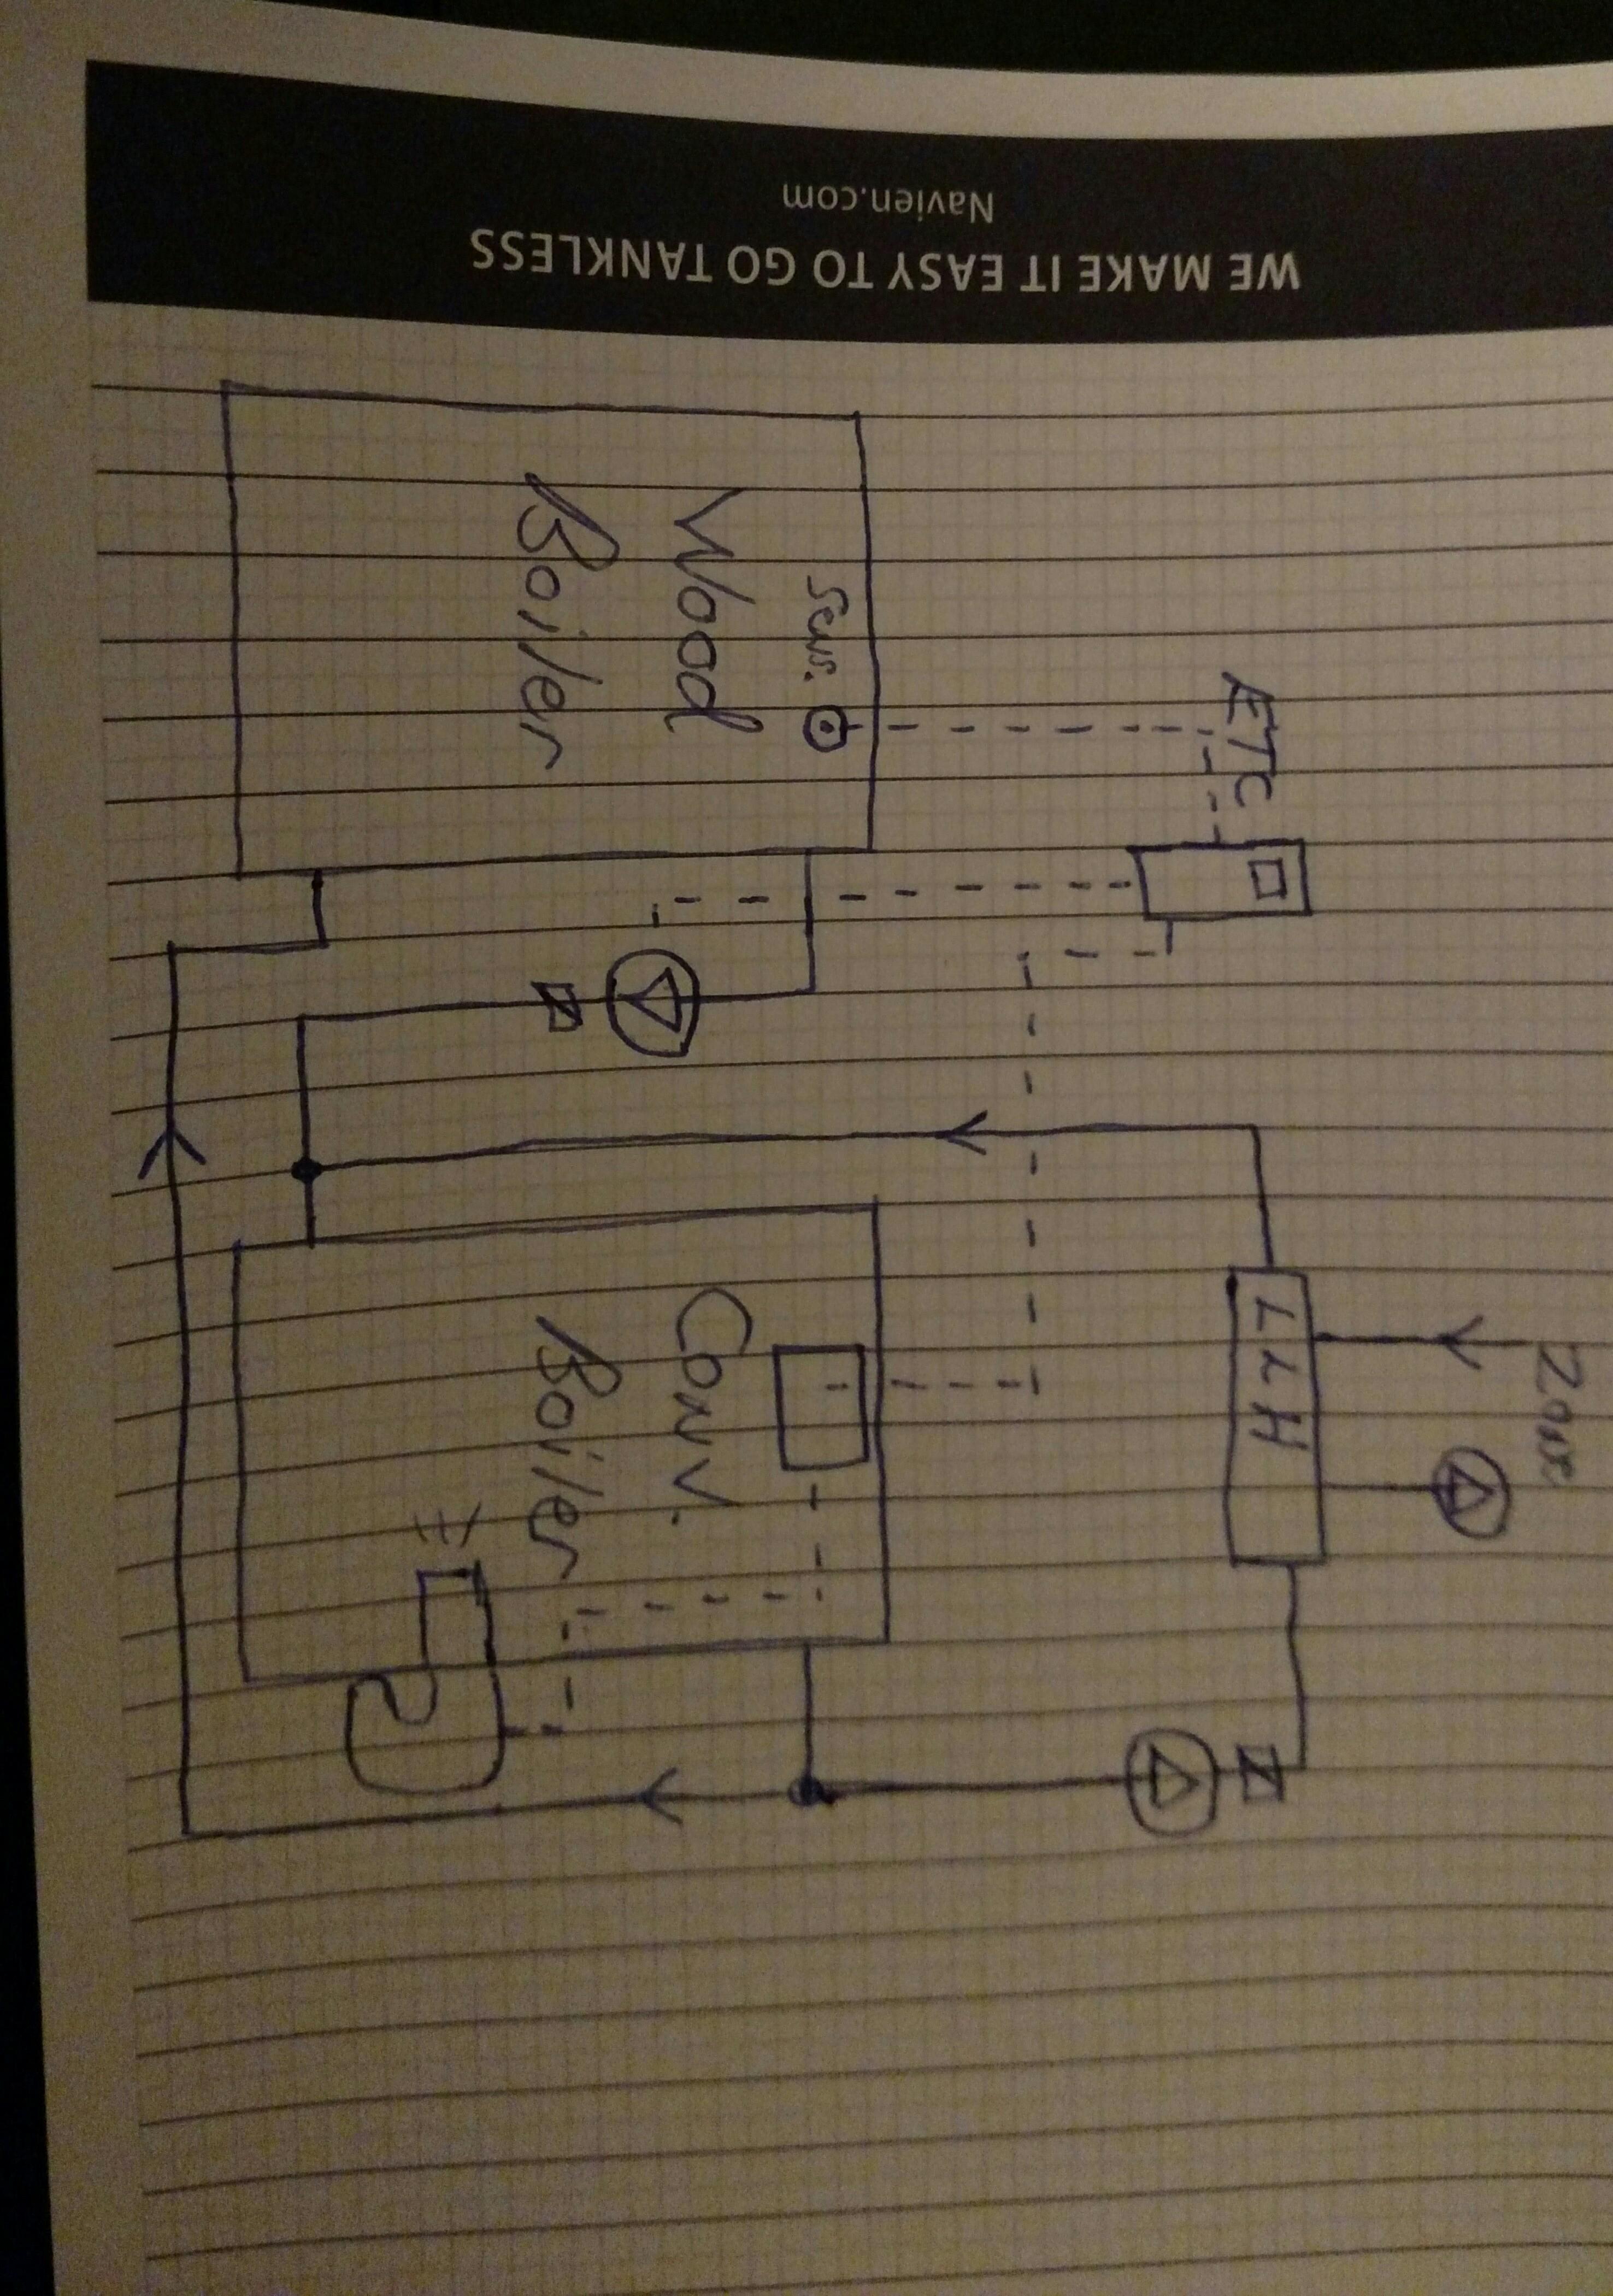 johnson controls a419 wiring diagram 2001 dodge ram trailer caleffi design  heating help the wall